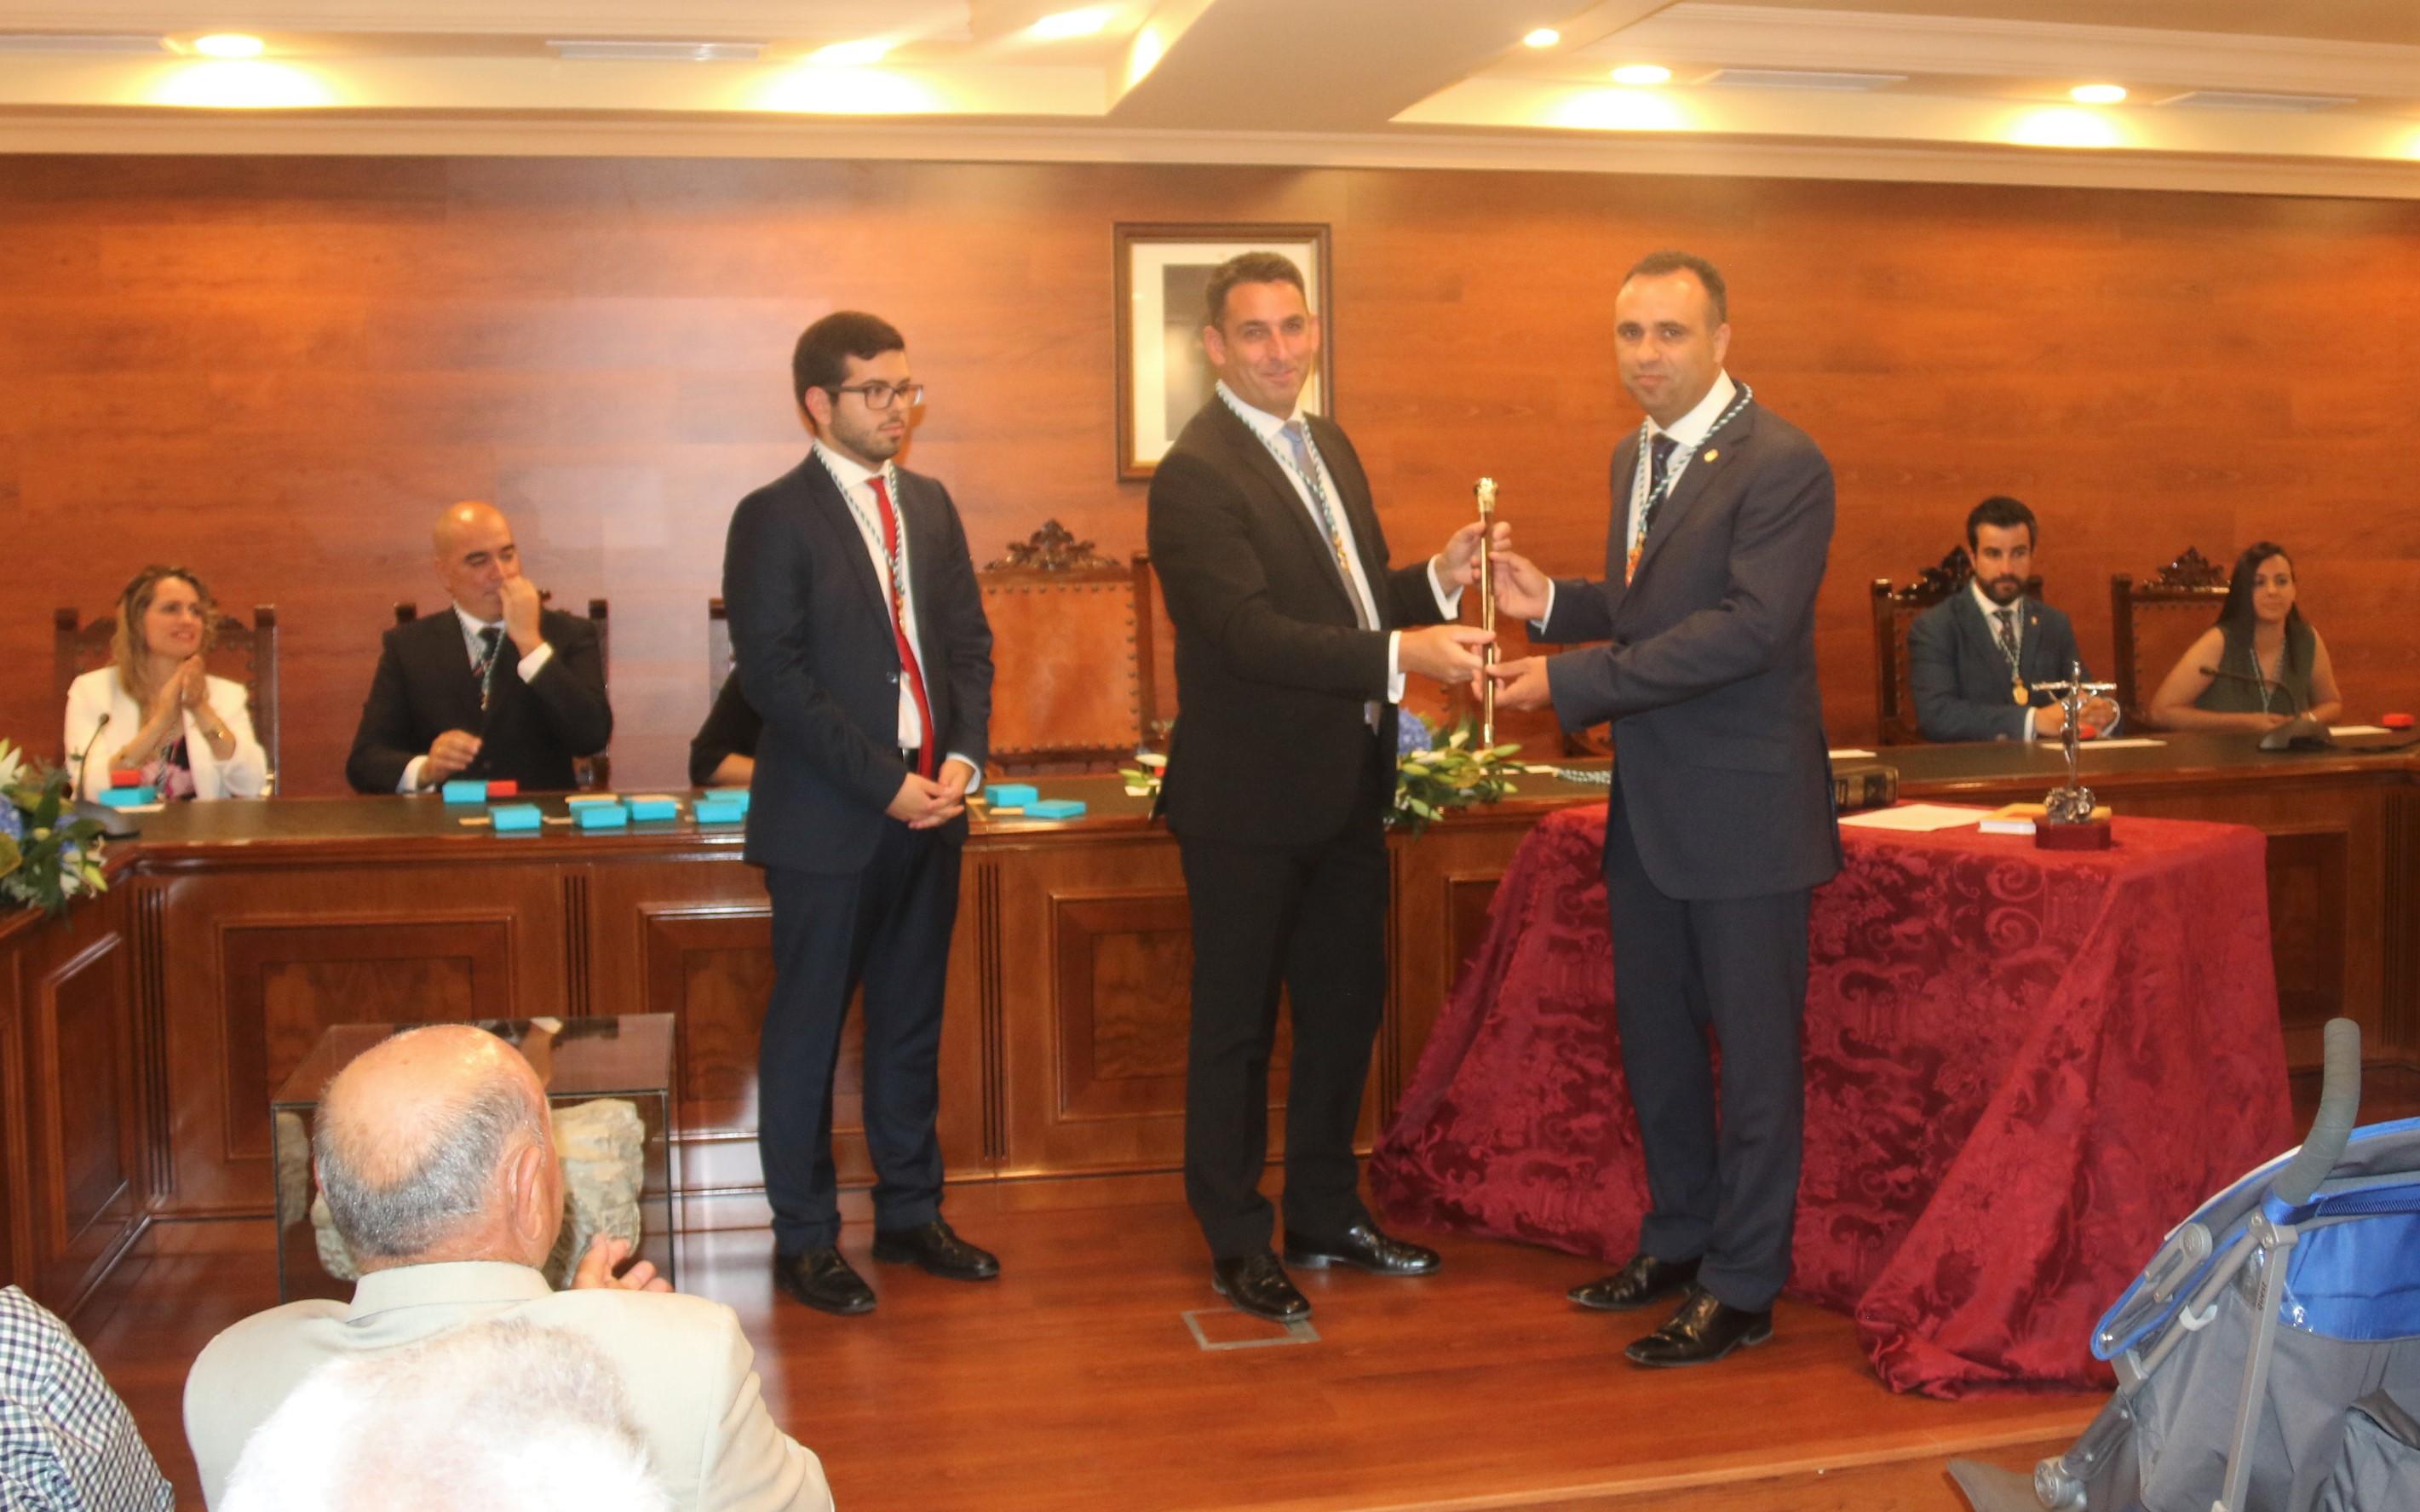 Francisco Rodríguez encara su tercer mandato como alcalde de Alhendín